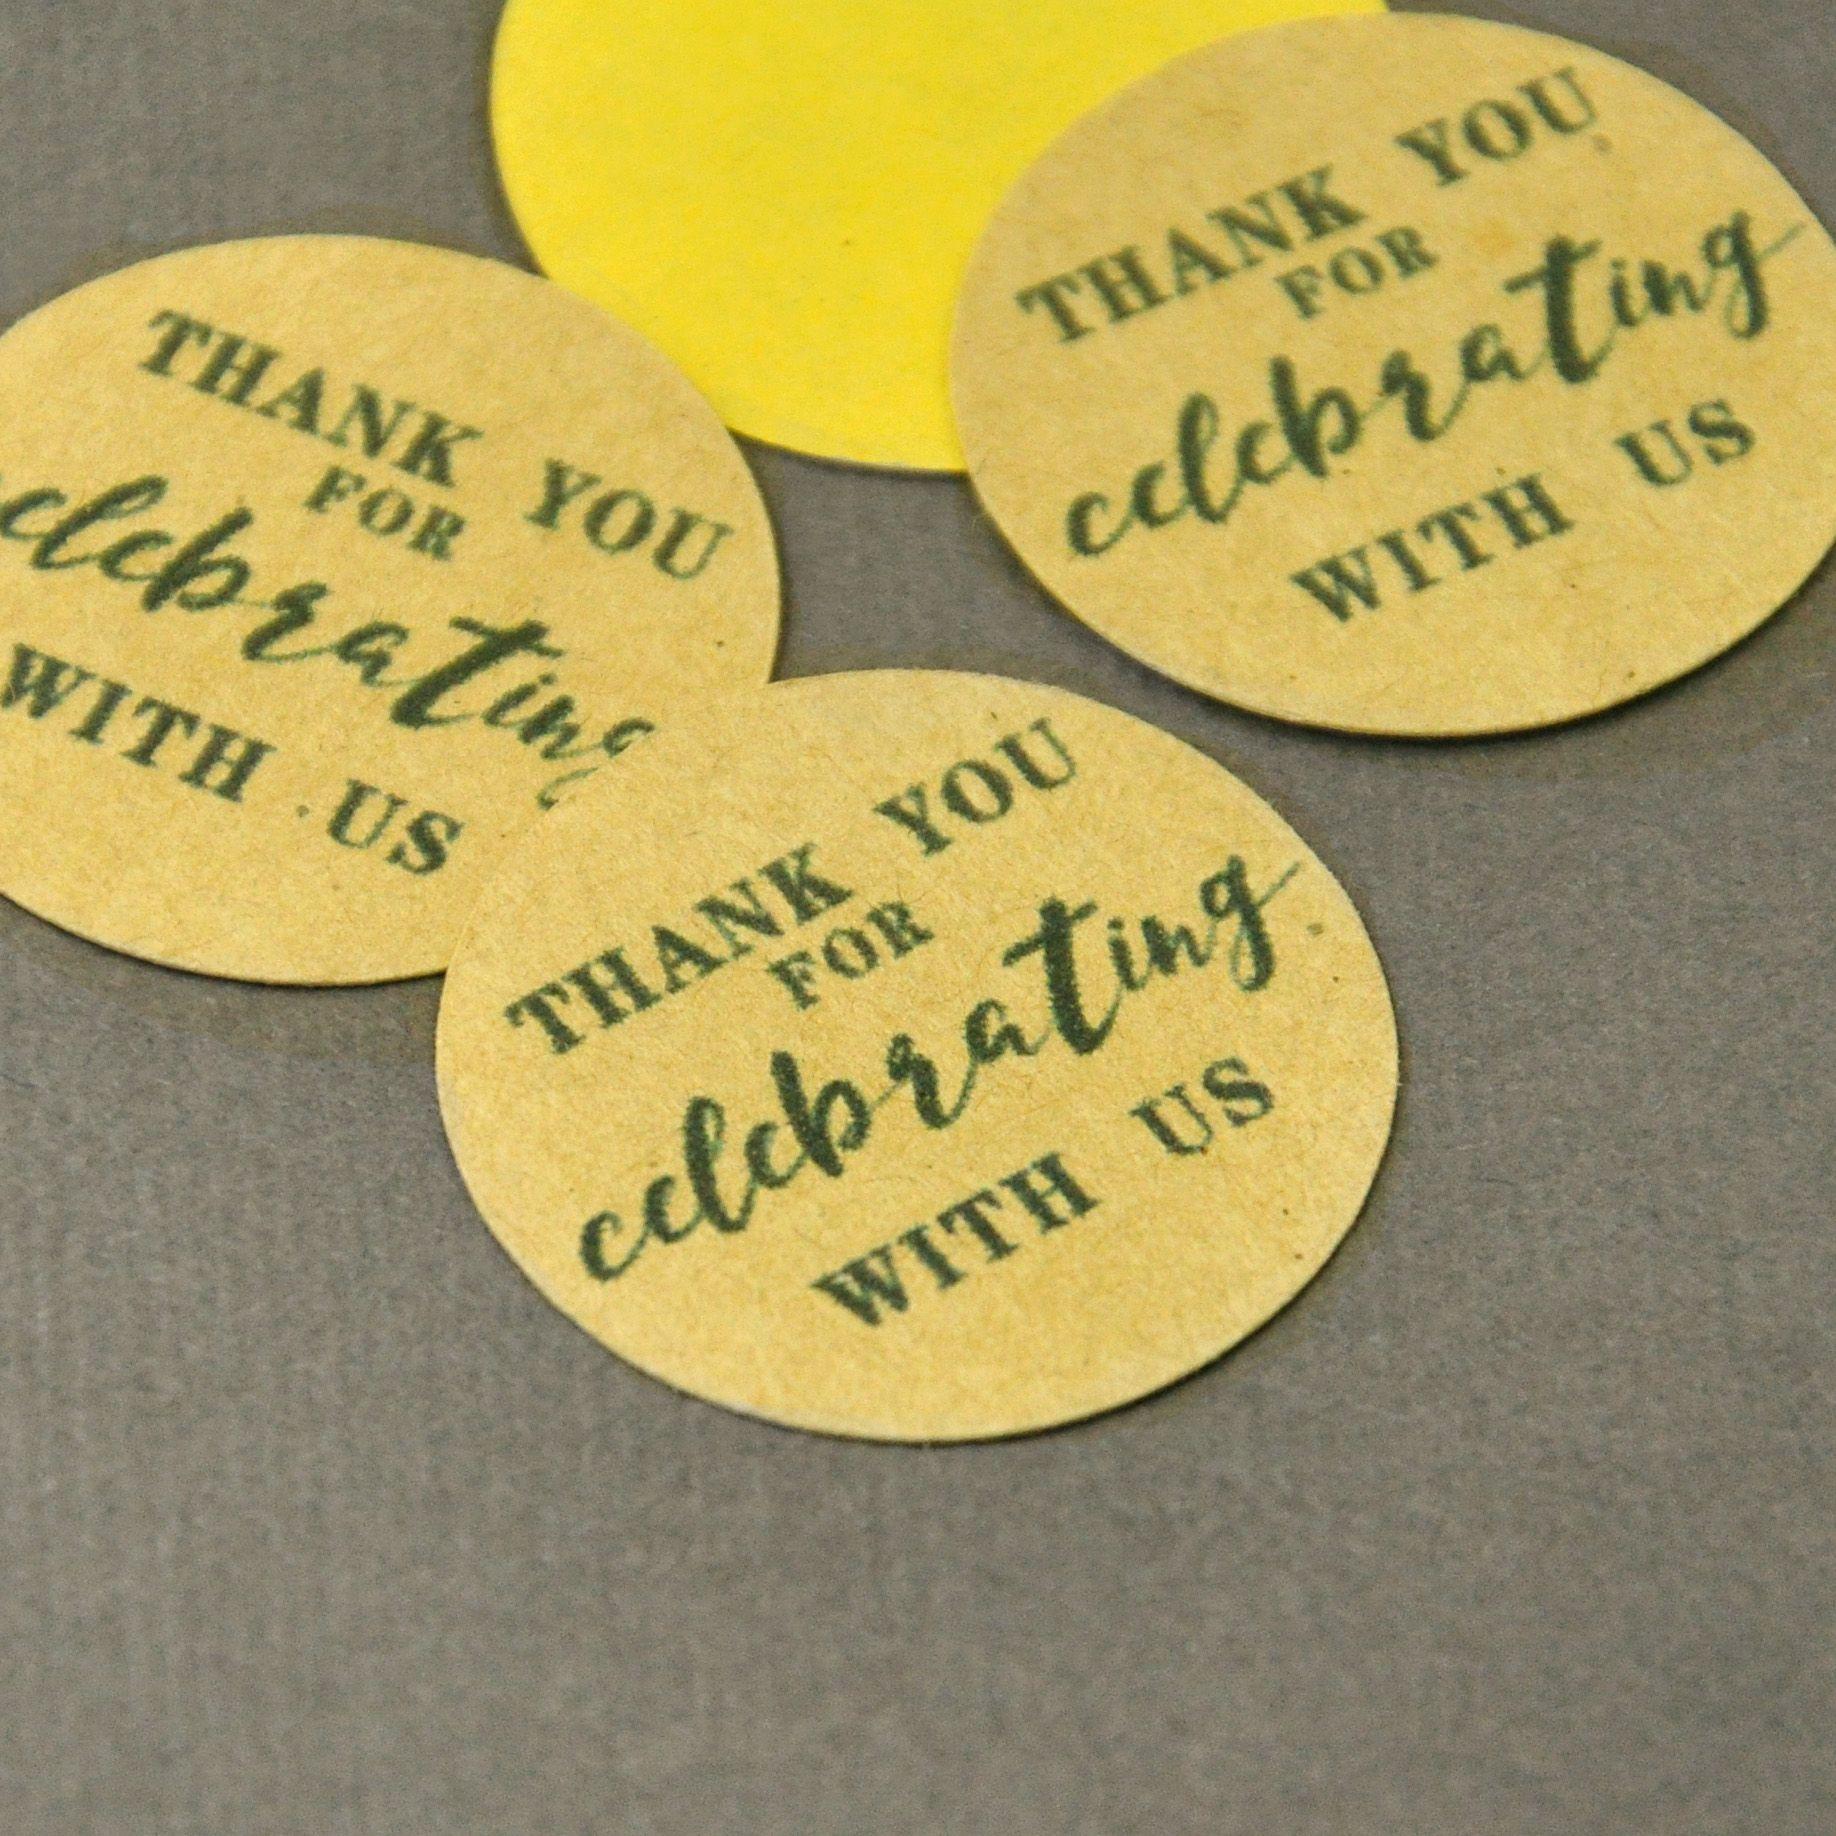 2018 wedding favor stickers,wedding favor labels,thank you sticker